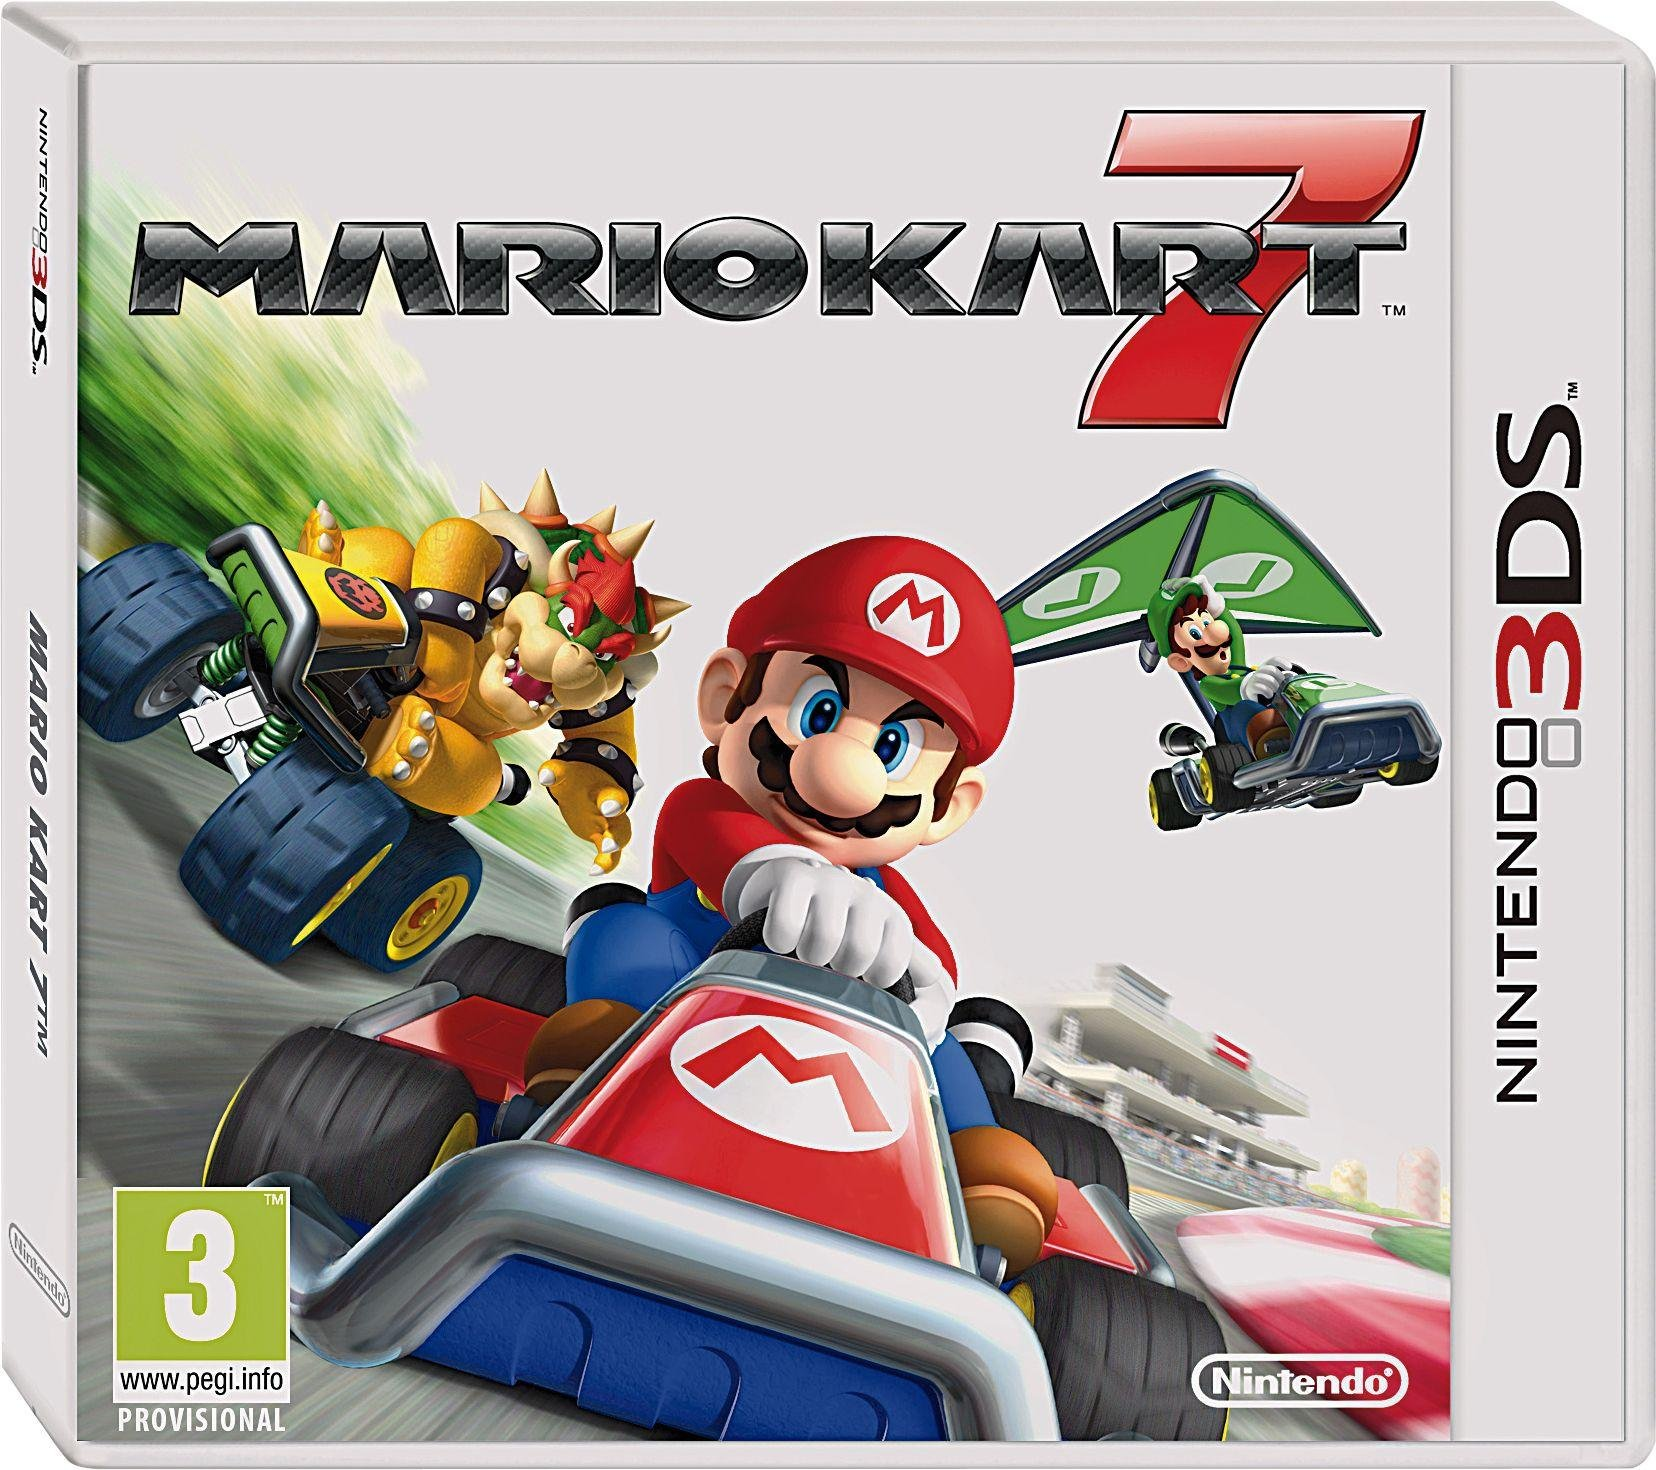 Nintendo Mario Kart 7 - 3DS Game.